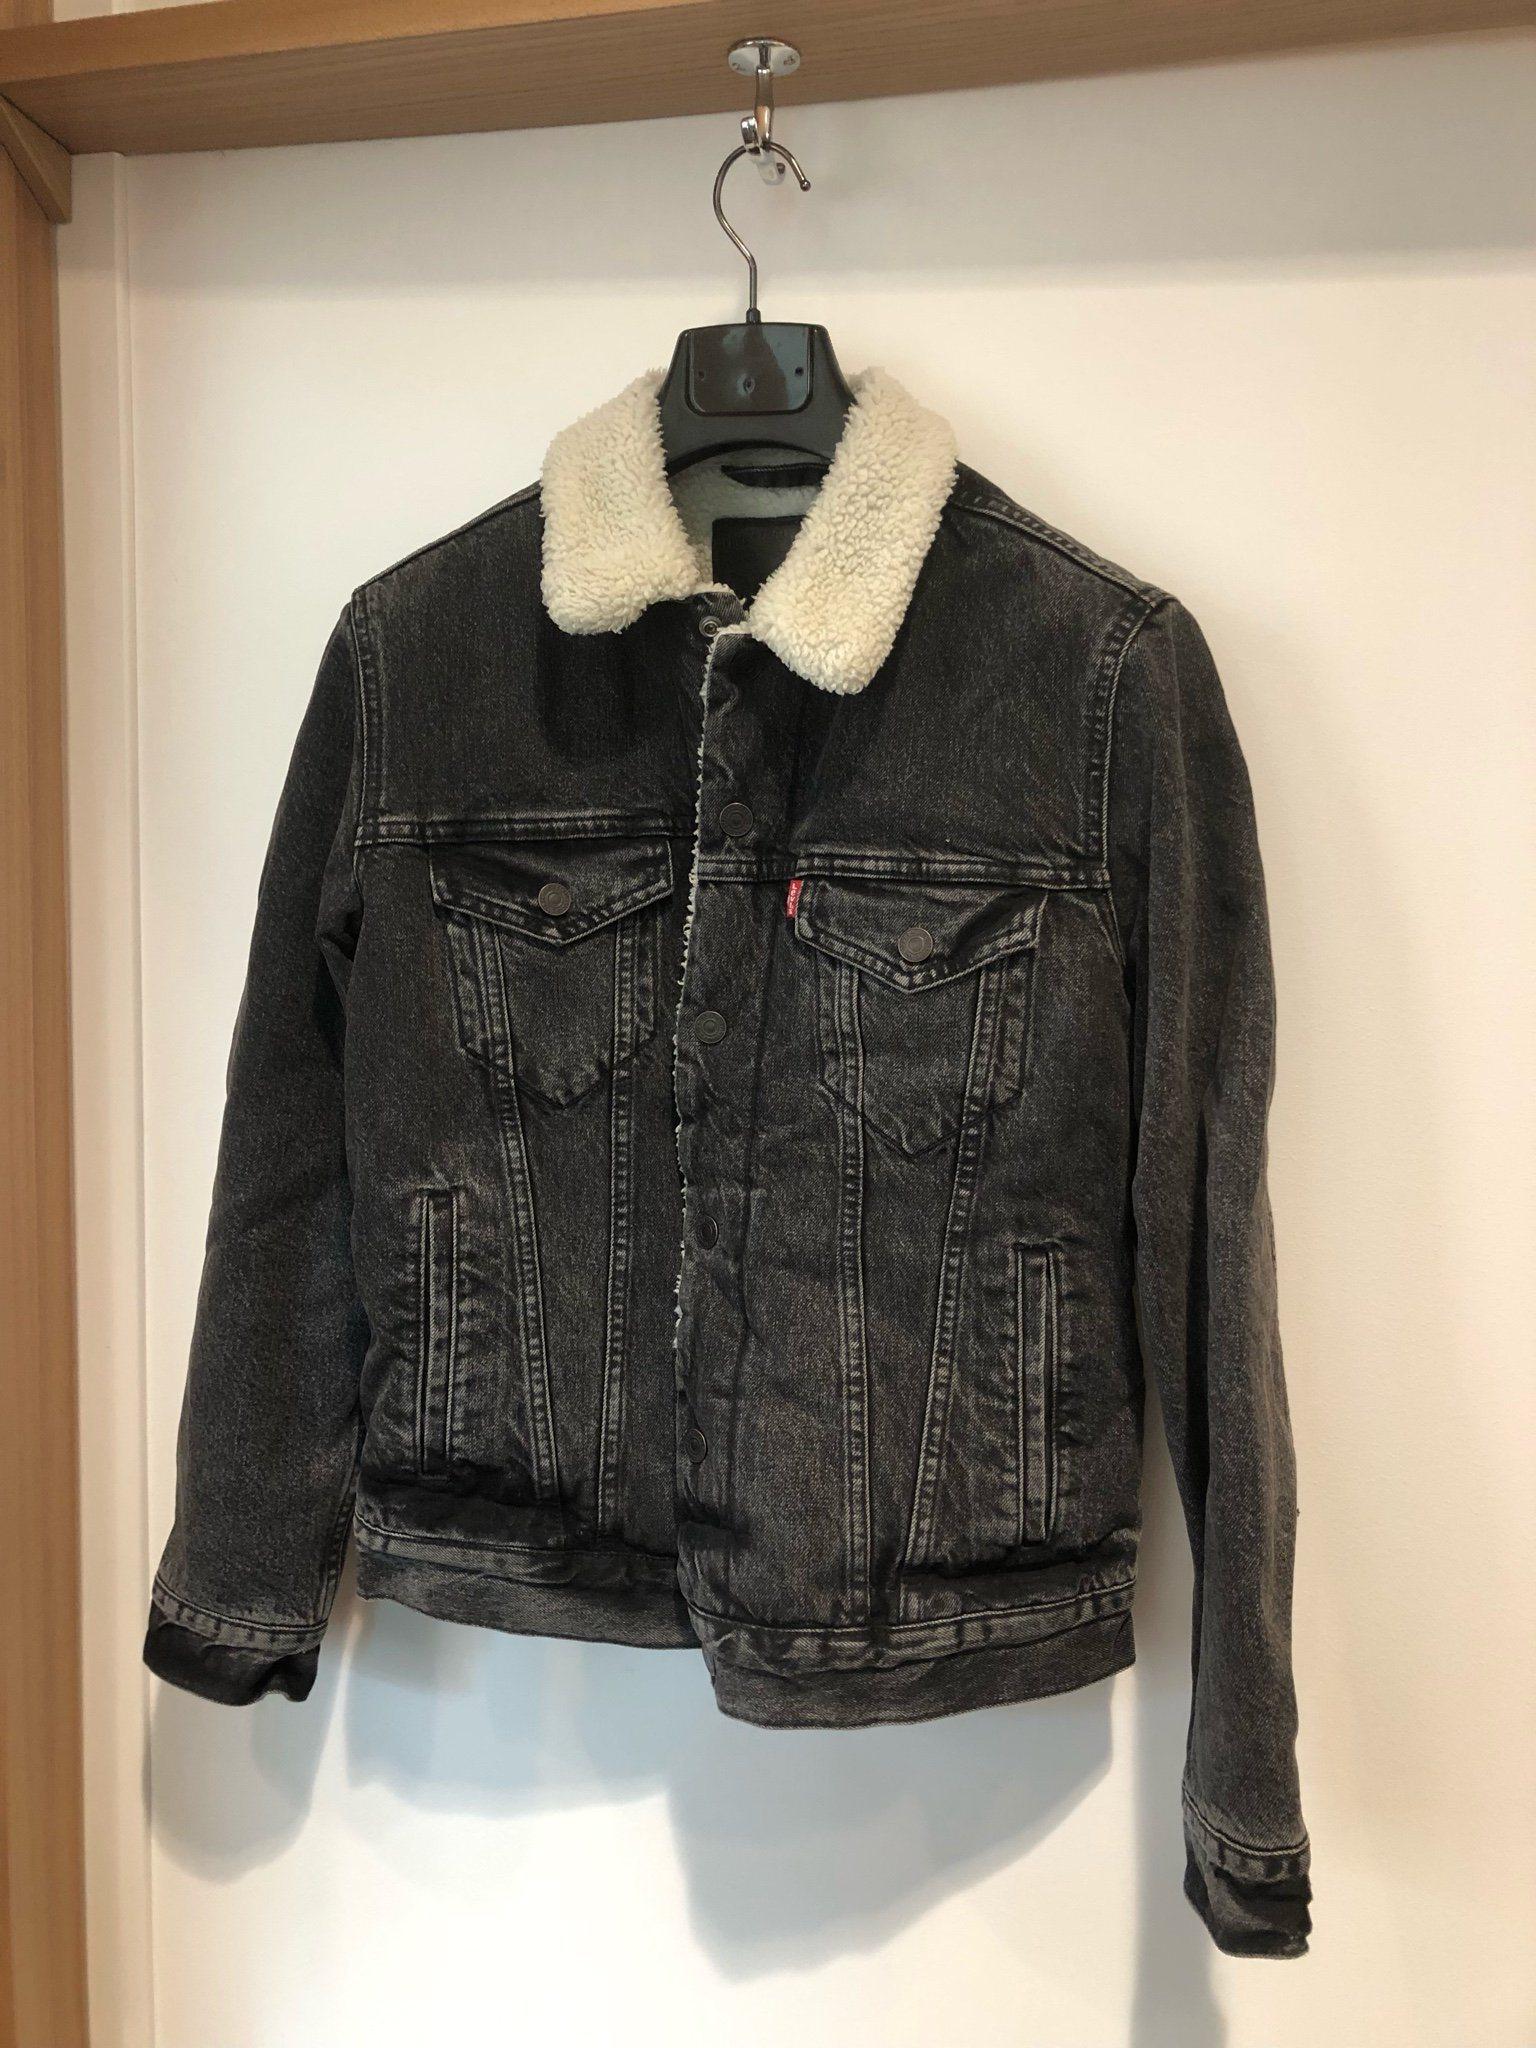 304eac9e389 Levi's jeans / denim sherpa jacka stl S (342979458) ᐈ Köp på Tradera